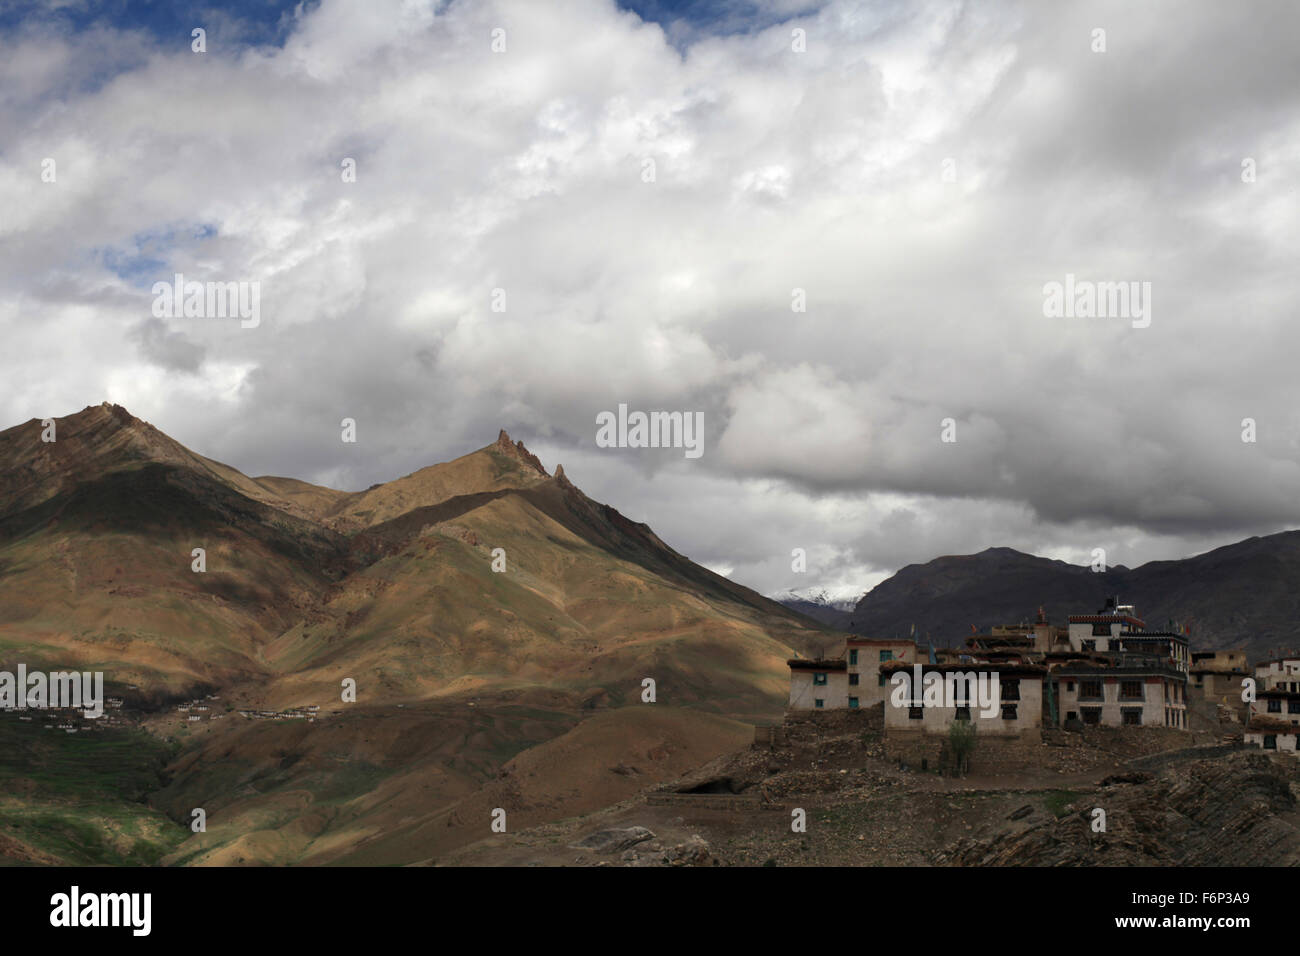 SPITI VALLEY - Rangarik Village, Himachal Pradesh, India - Stock Image